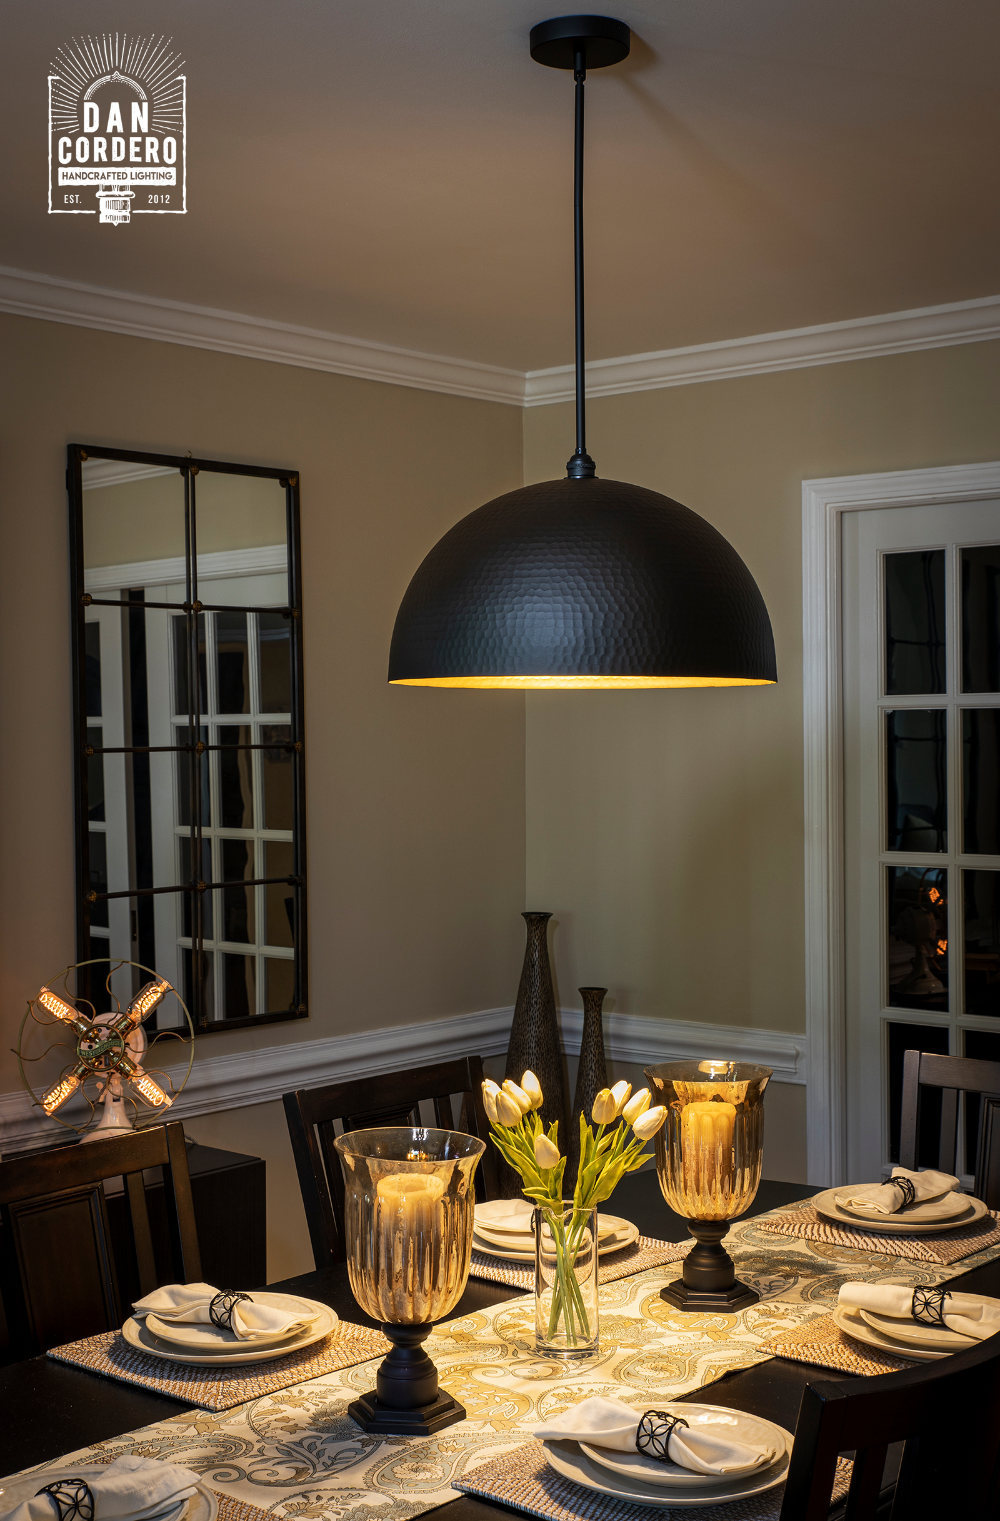 Oversized Hammered Flat Black Pendant Light Fixture Dome Pendant Lighting Pendant Lamp Dining Dining Light Fixtures